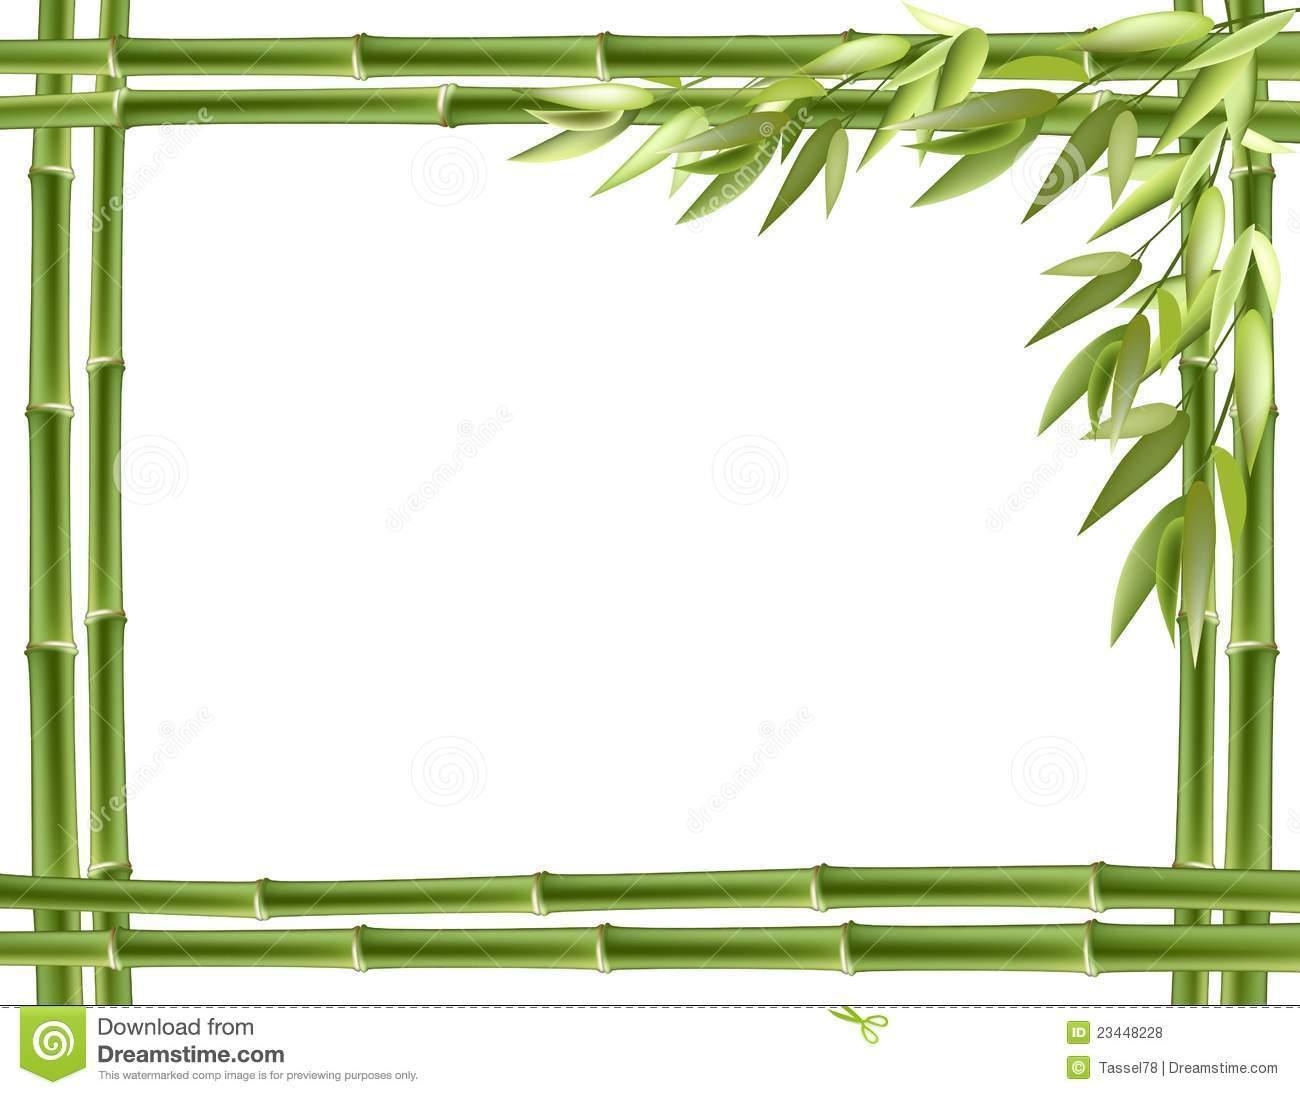 Bamboo border clipart free 1 » Clipart Portal.